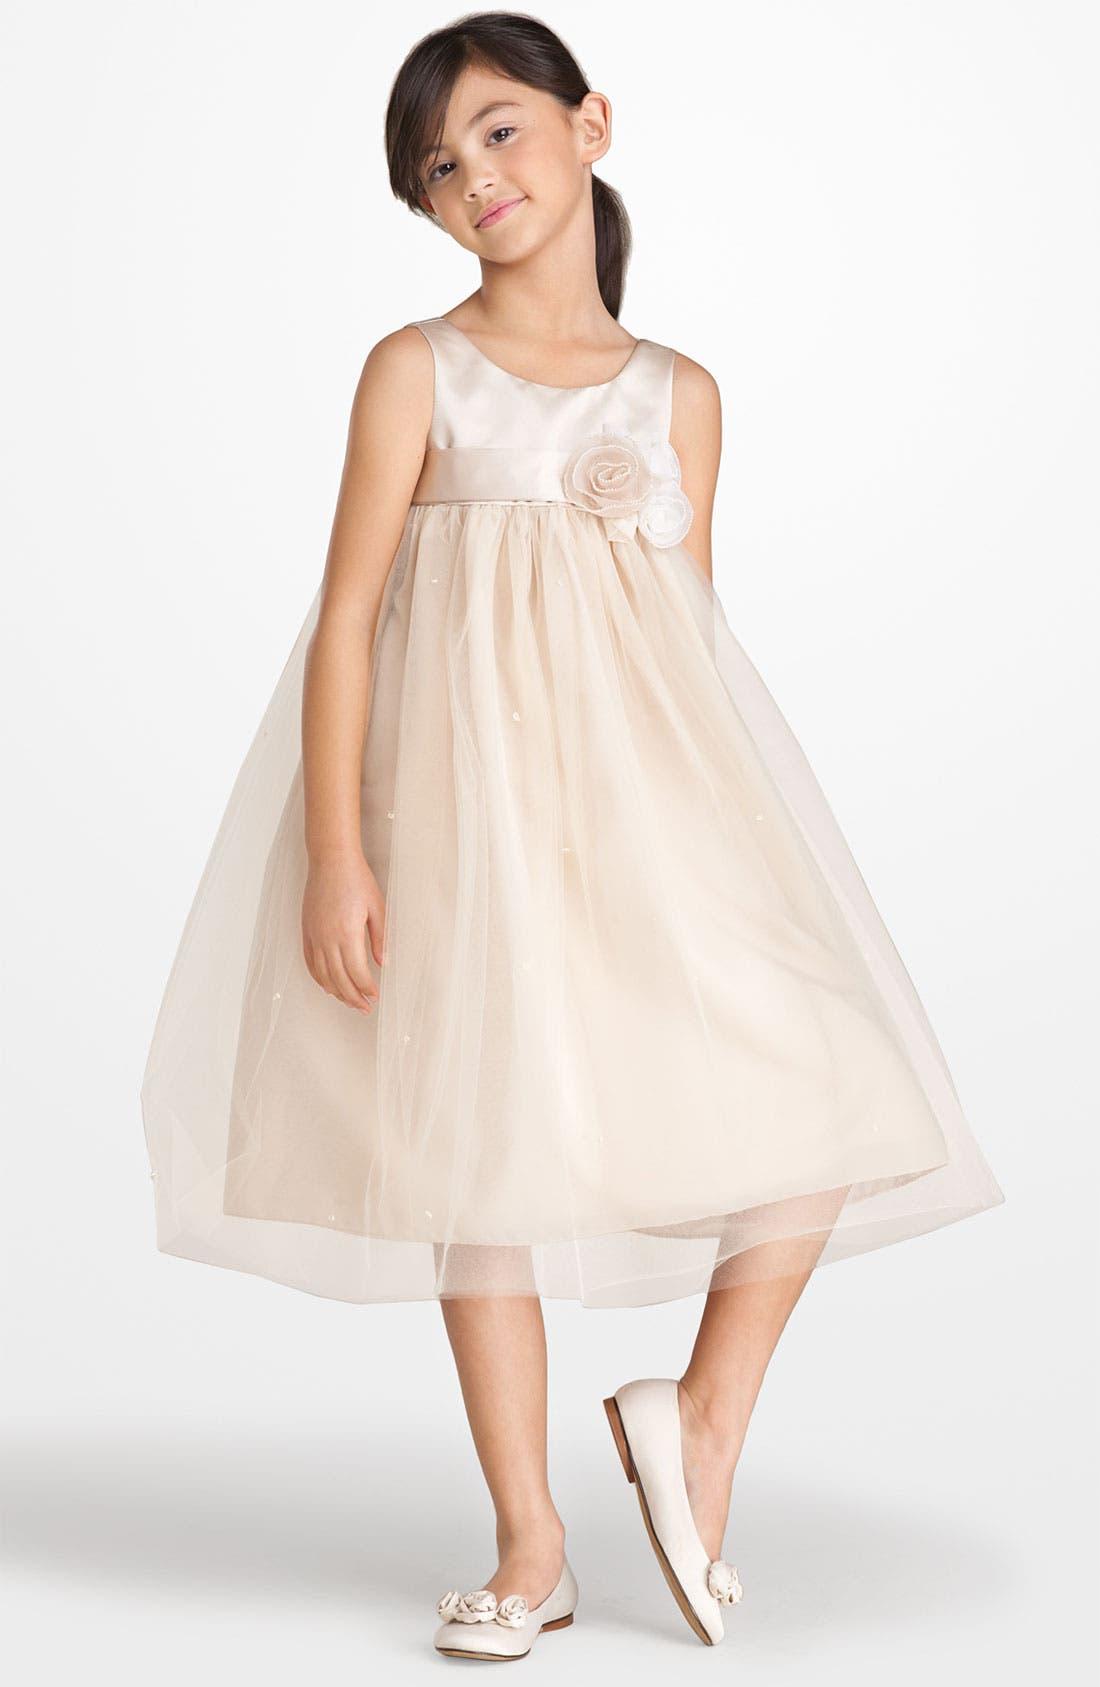 Main Image - Us Angels Sleeveless Satin & Tulle Dress (Little Girls)